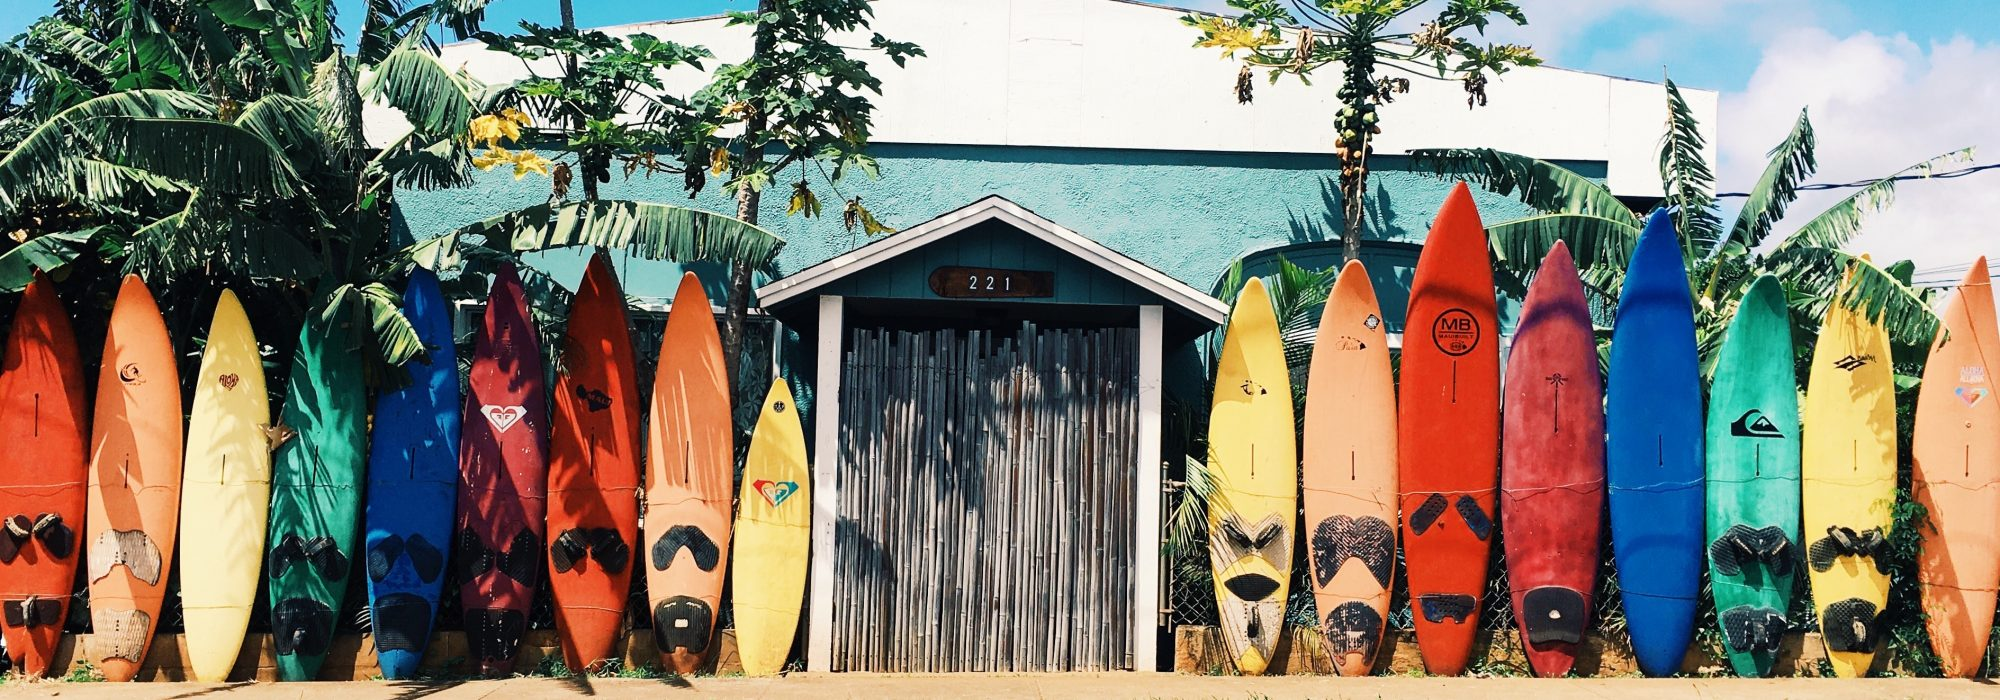 Travel Guide: Hawaii/Oahu Vacation